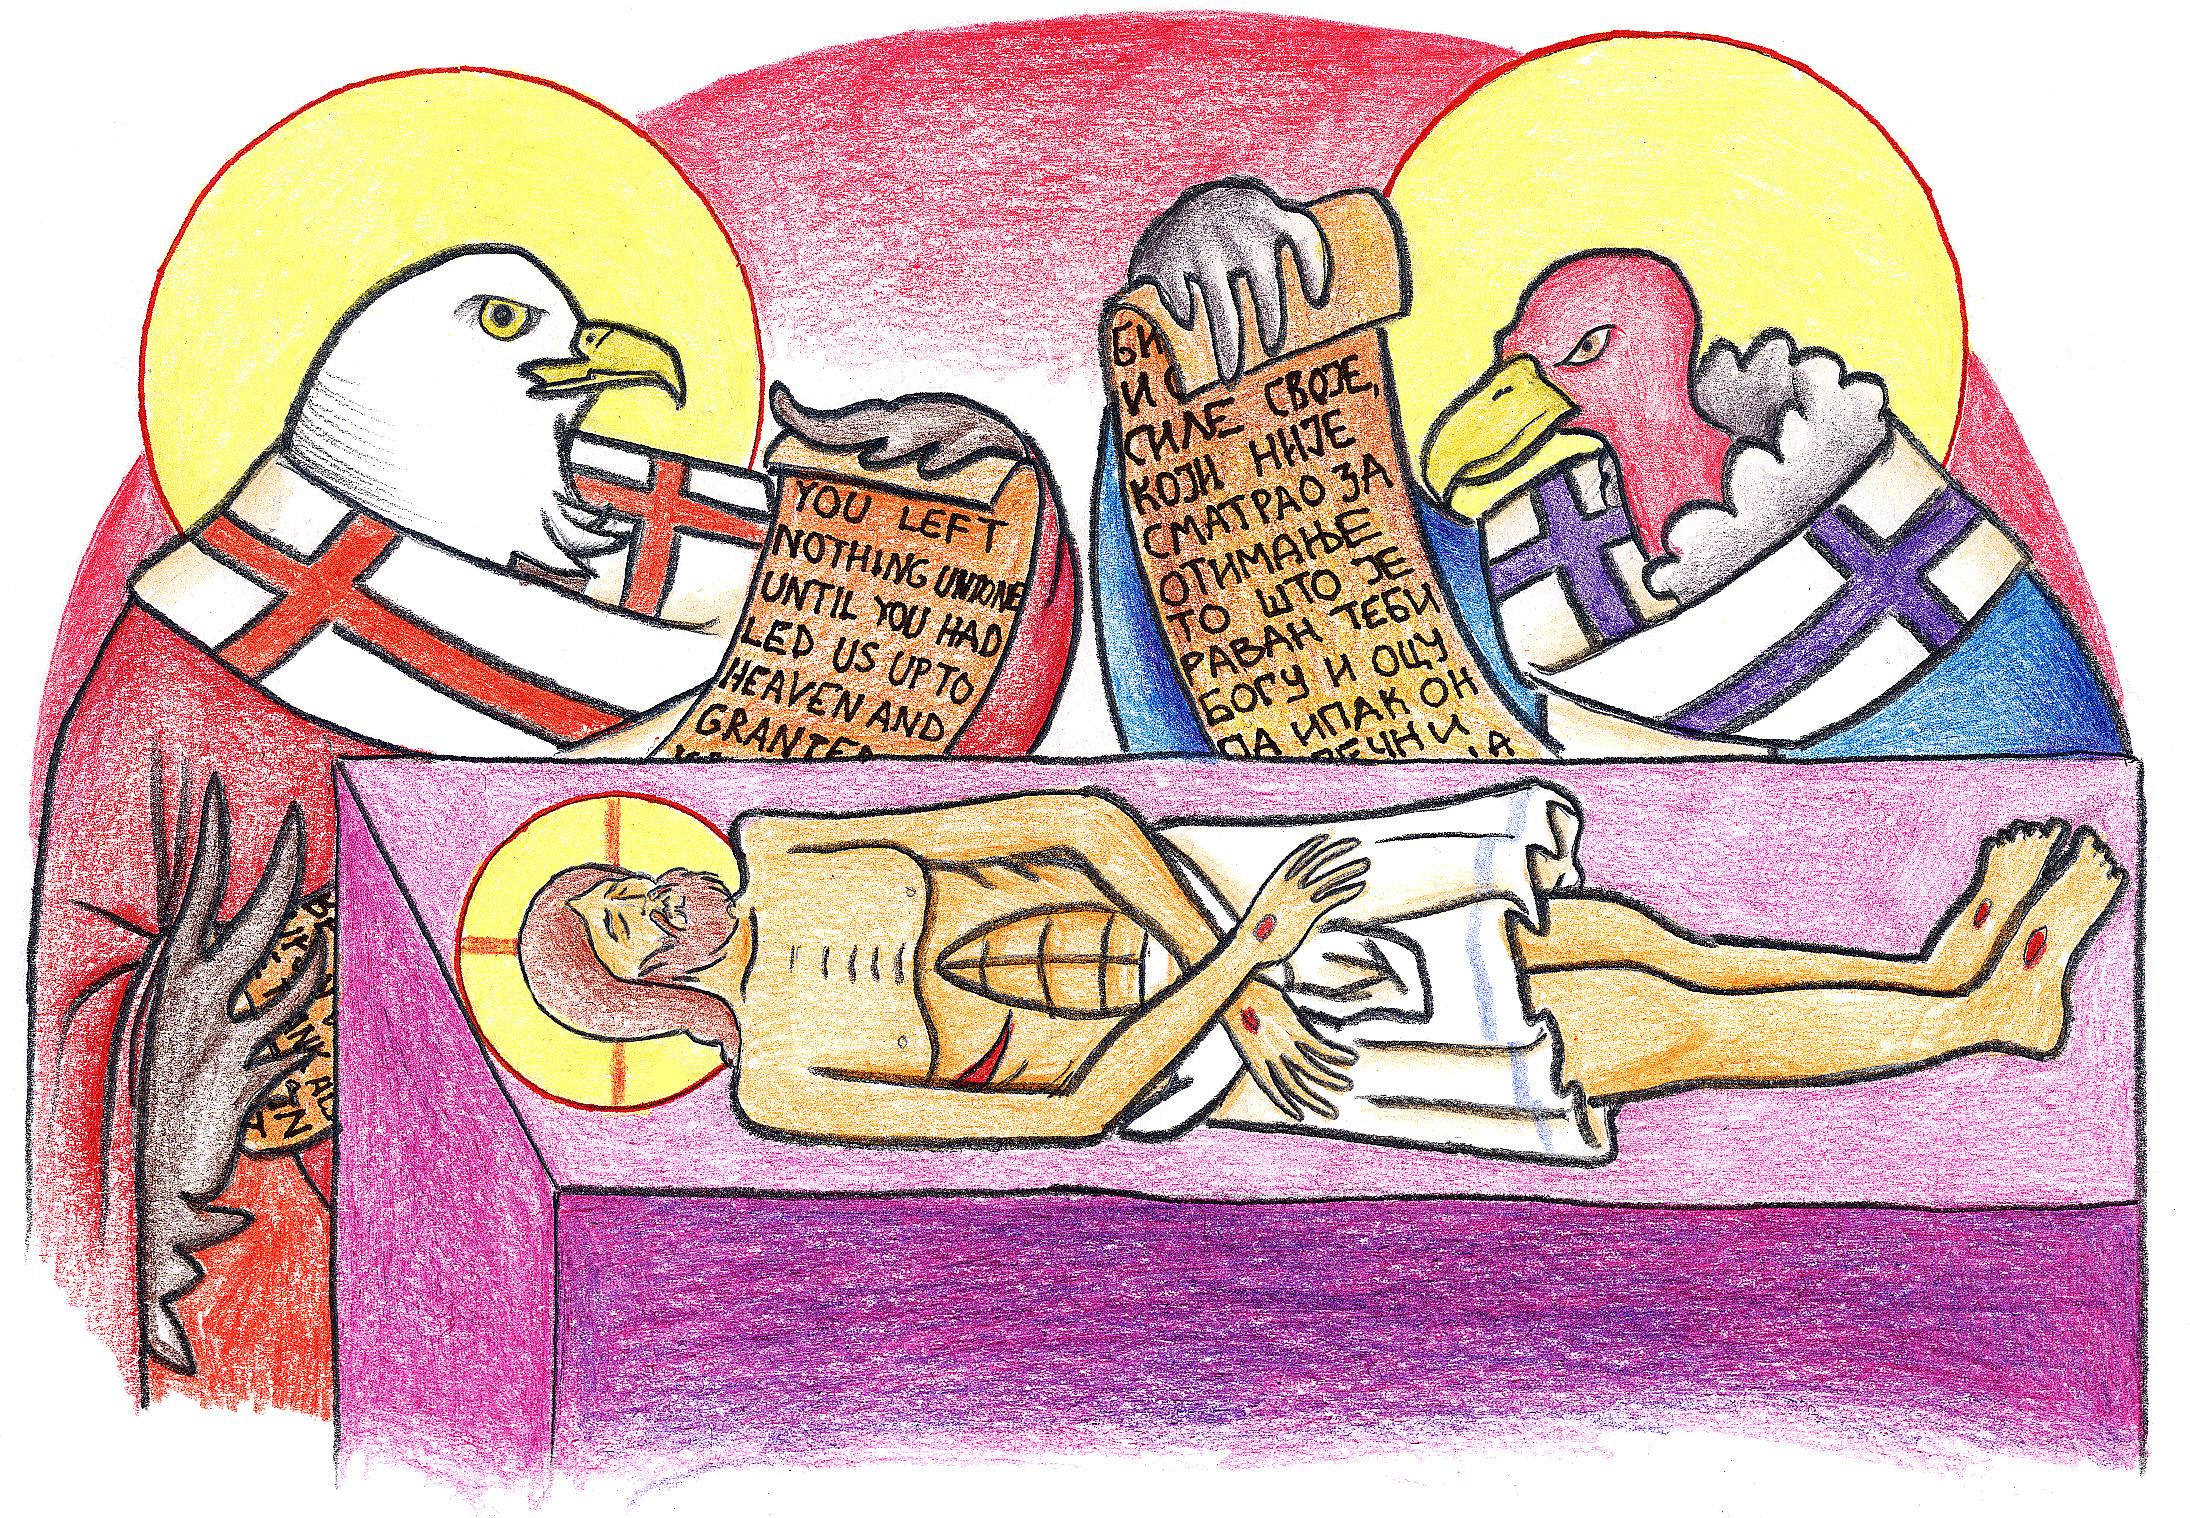 Matthew 24:28 by Parastos